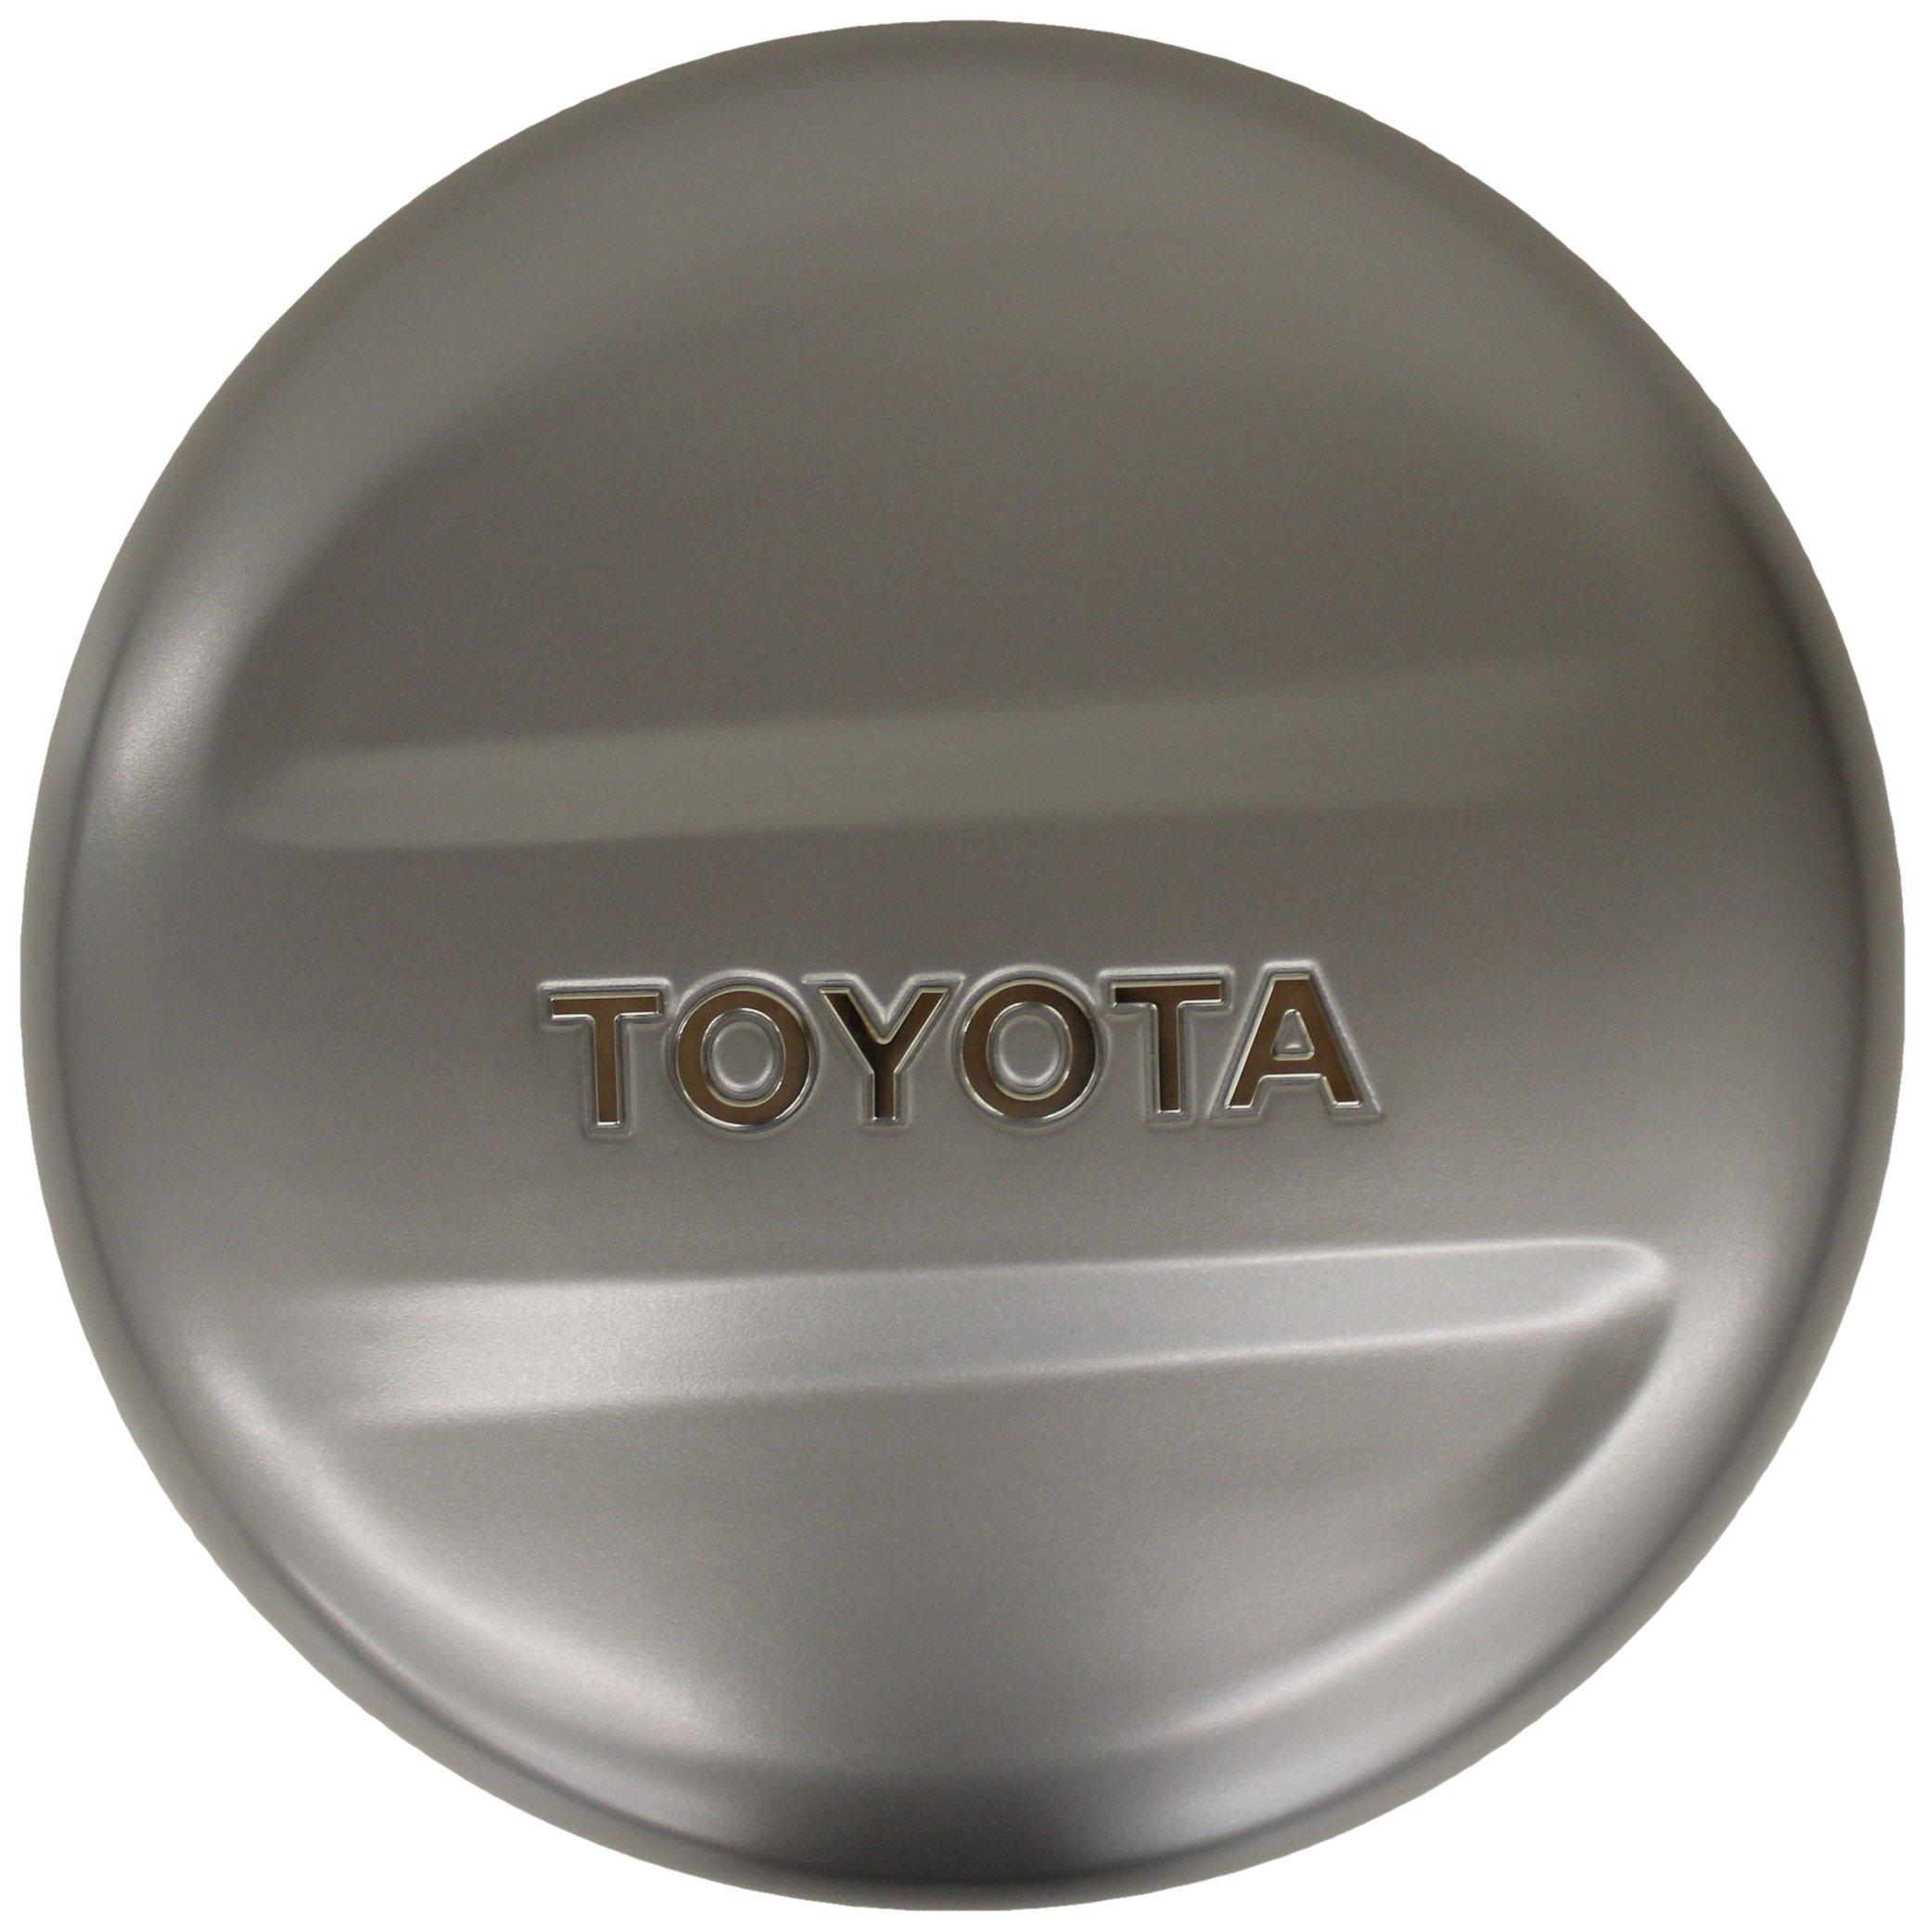 TOYOTA Genuine 64771-52070 Spare Wheel Cover